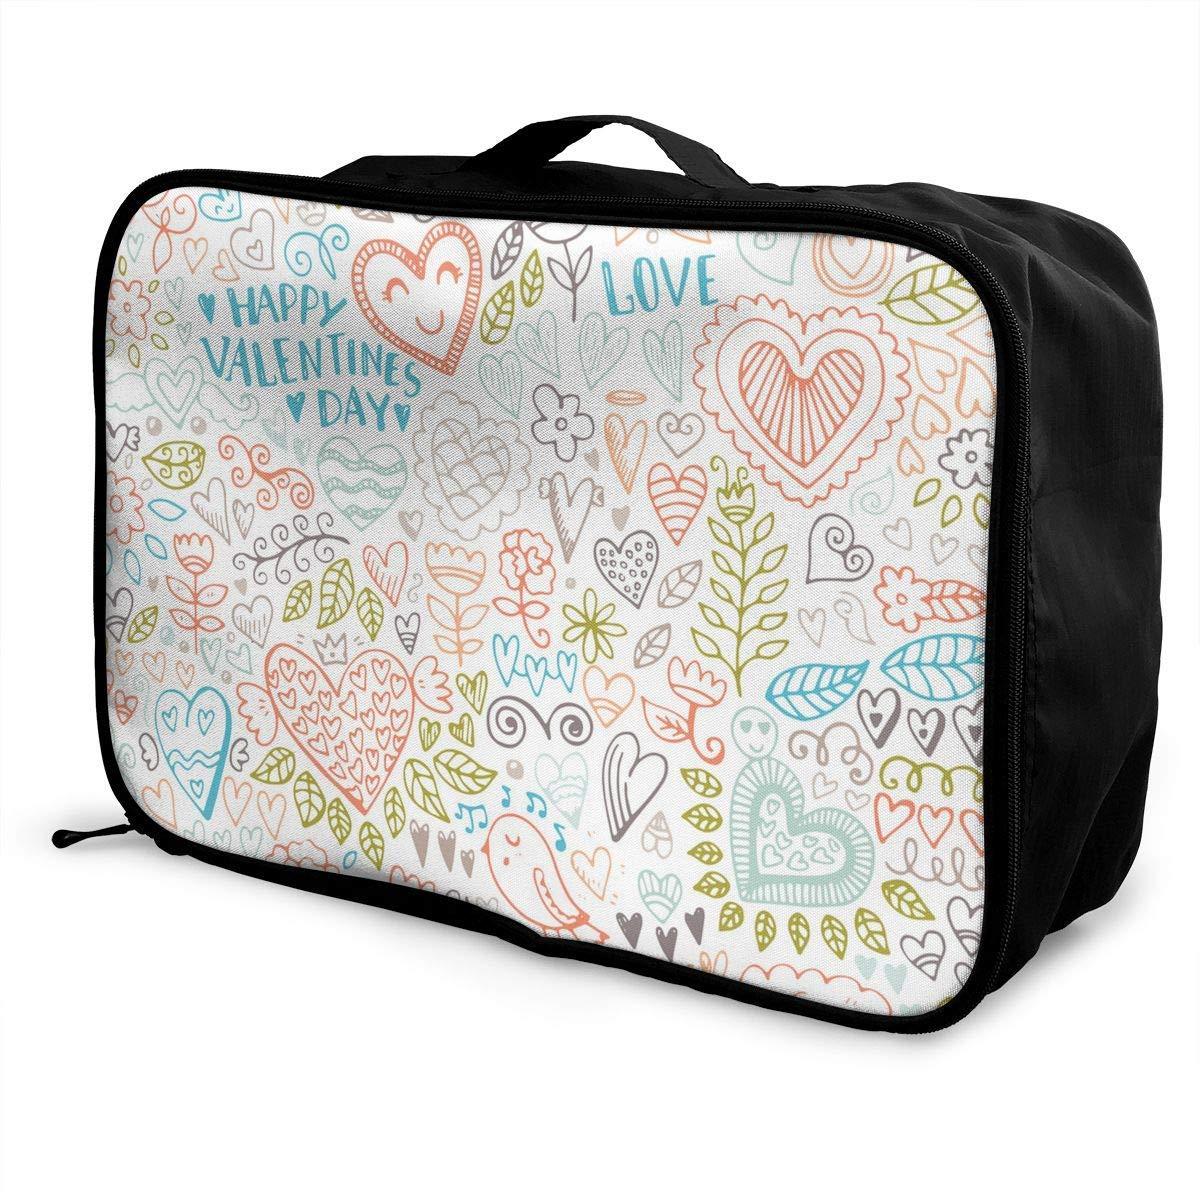 Love Heart Patterns Travel Duffel Bag Waterproof Fashion Lightweight Large Capacity Portable Duffel Bag for Men /& Women JTRVW Luggage Bags for Travel